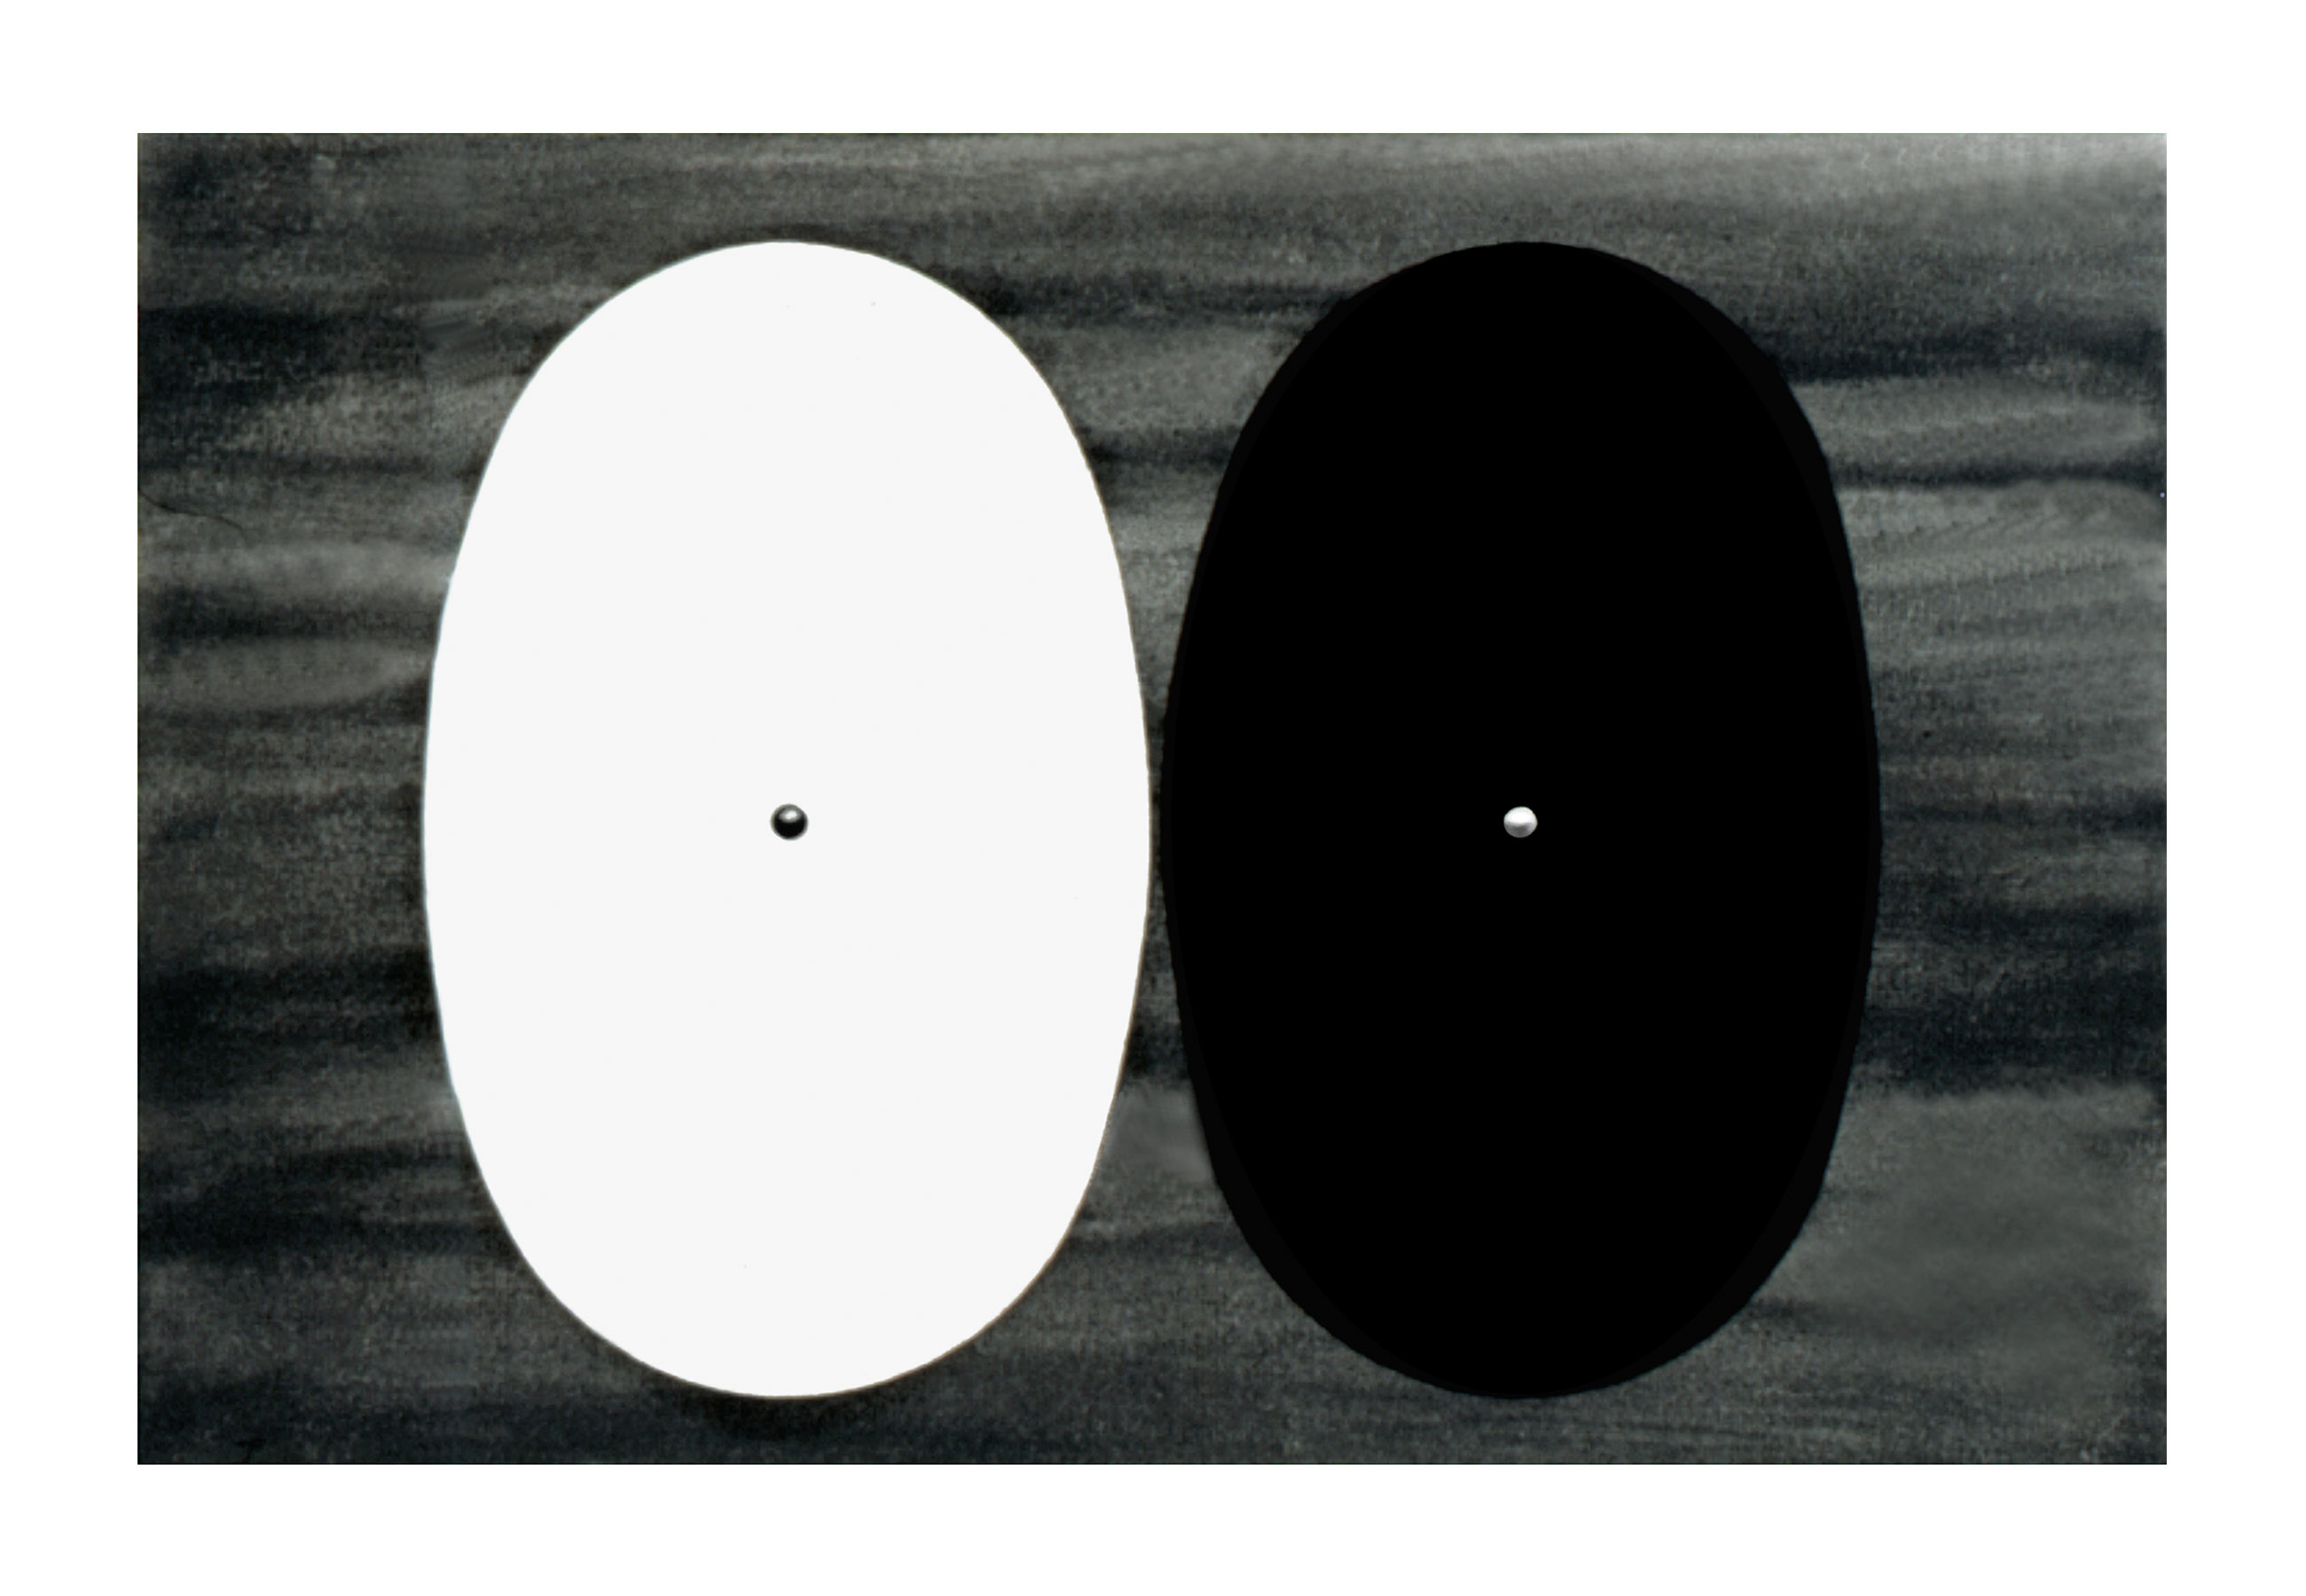 Lamm-Portfolio-Two-Beginnings-One-Universe.jpg